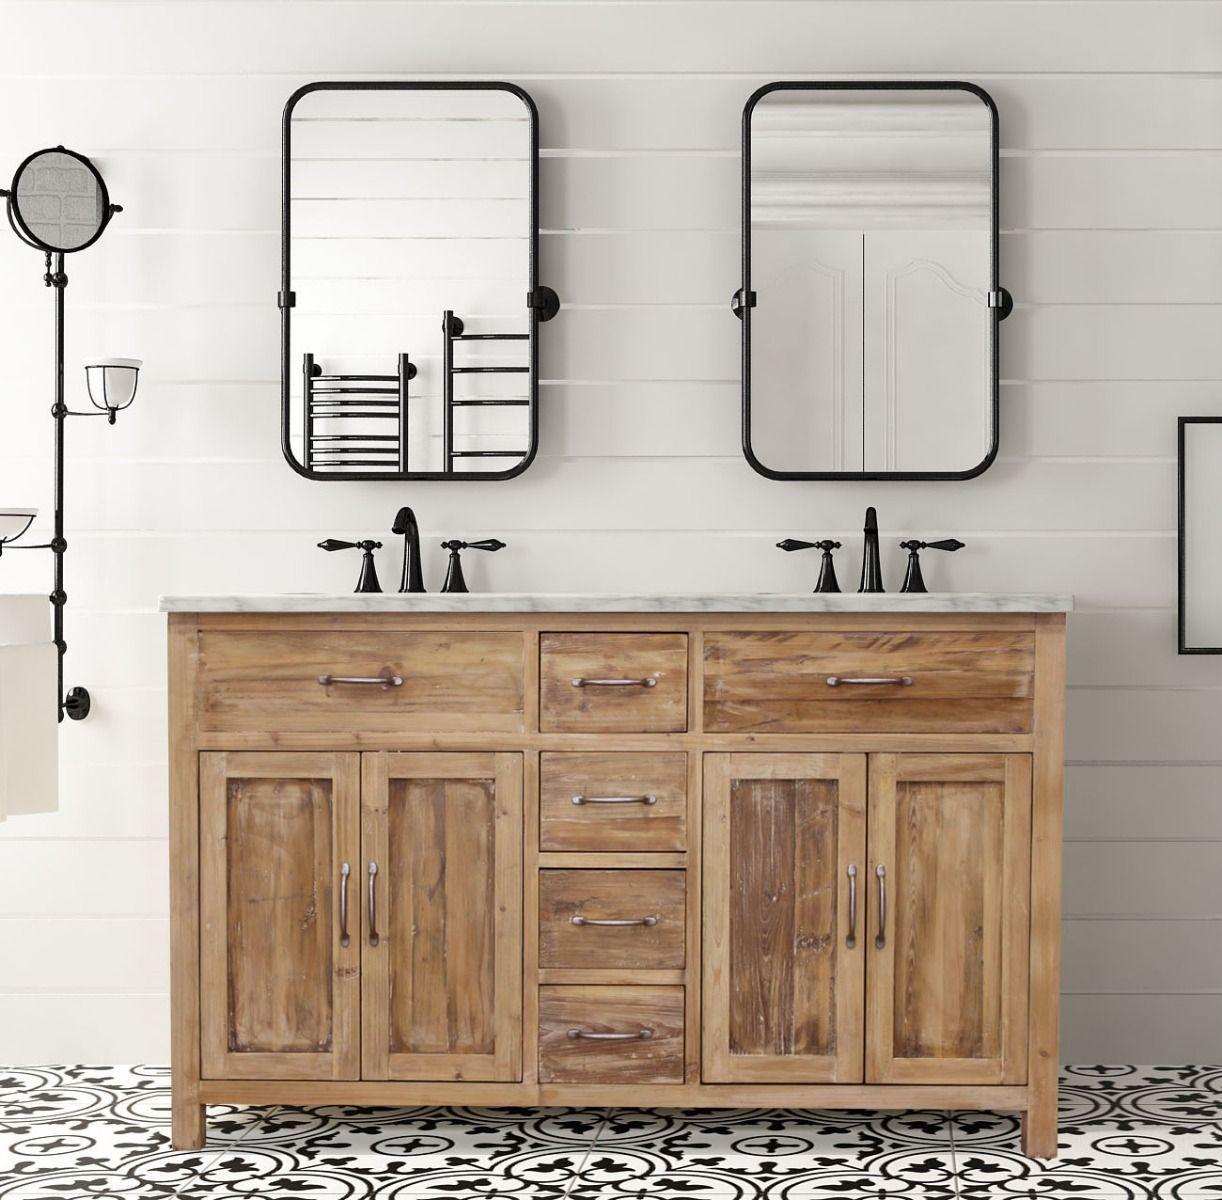 72 Woodland Italian Carrara Marble Natural Pine Marble Bathroom Bathroom Vanity Small Bathroom